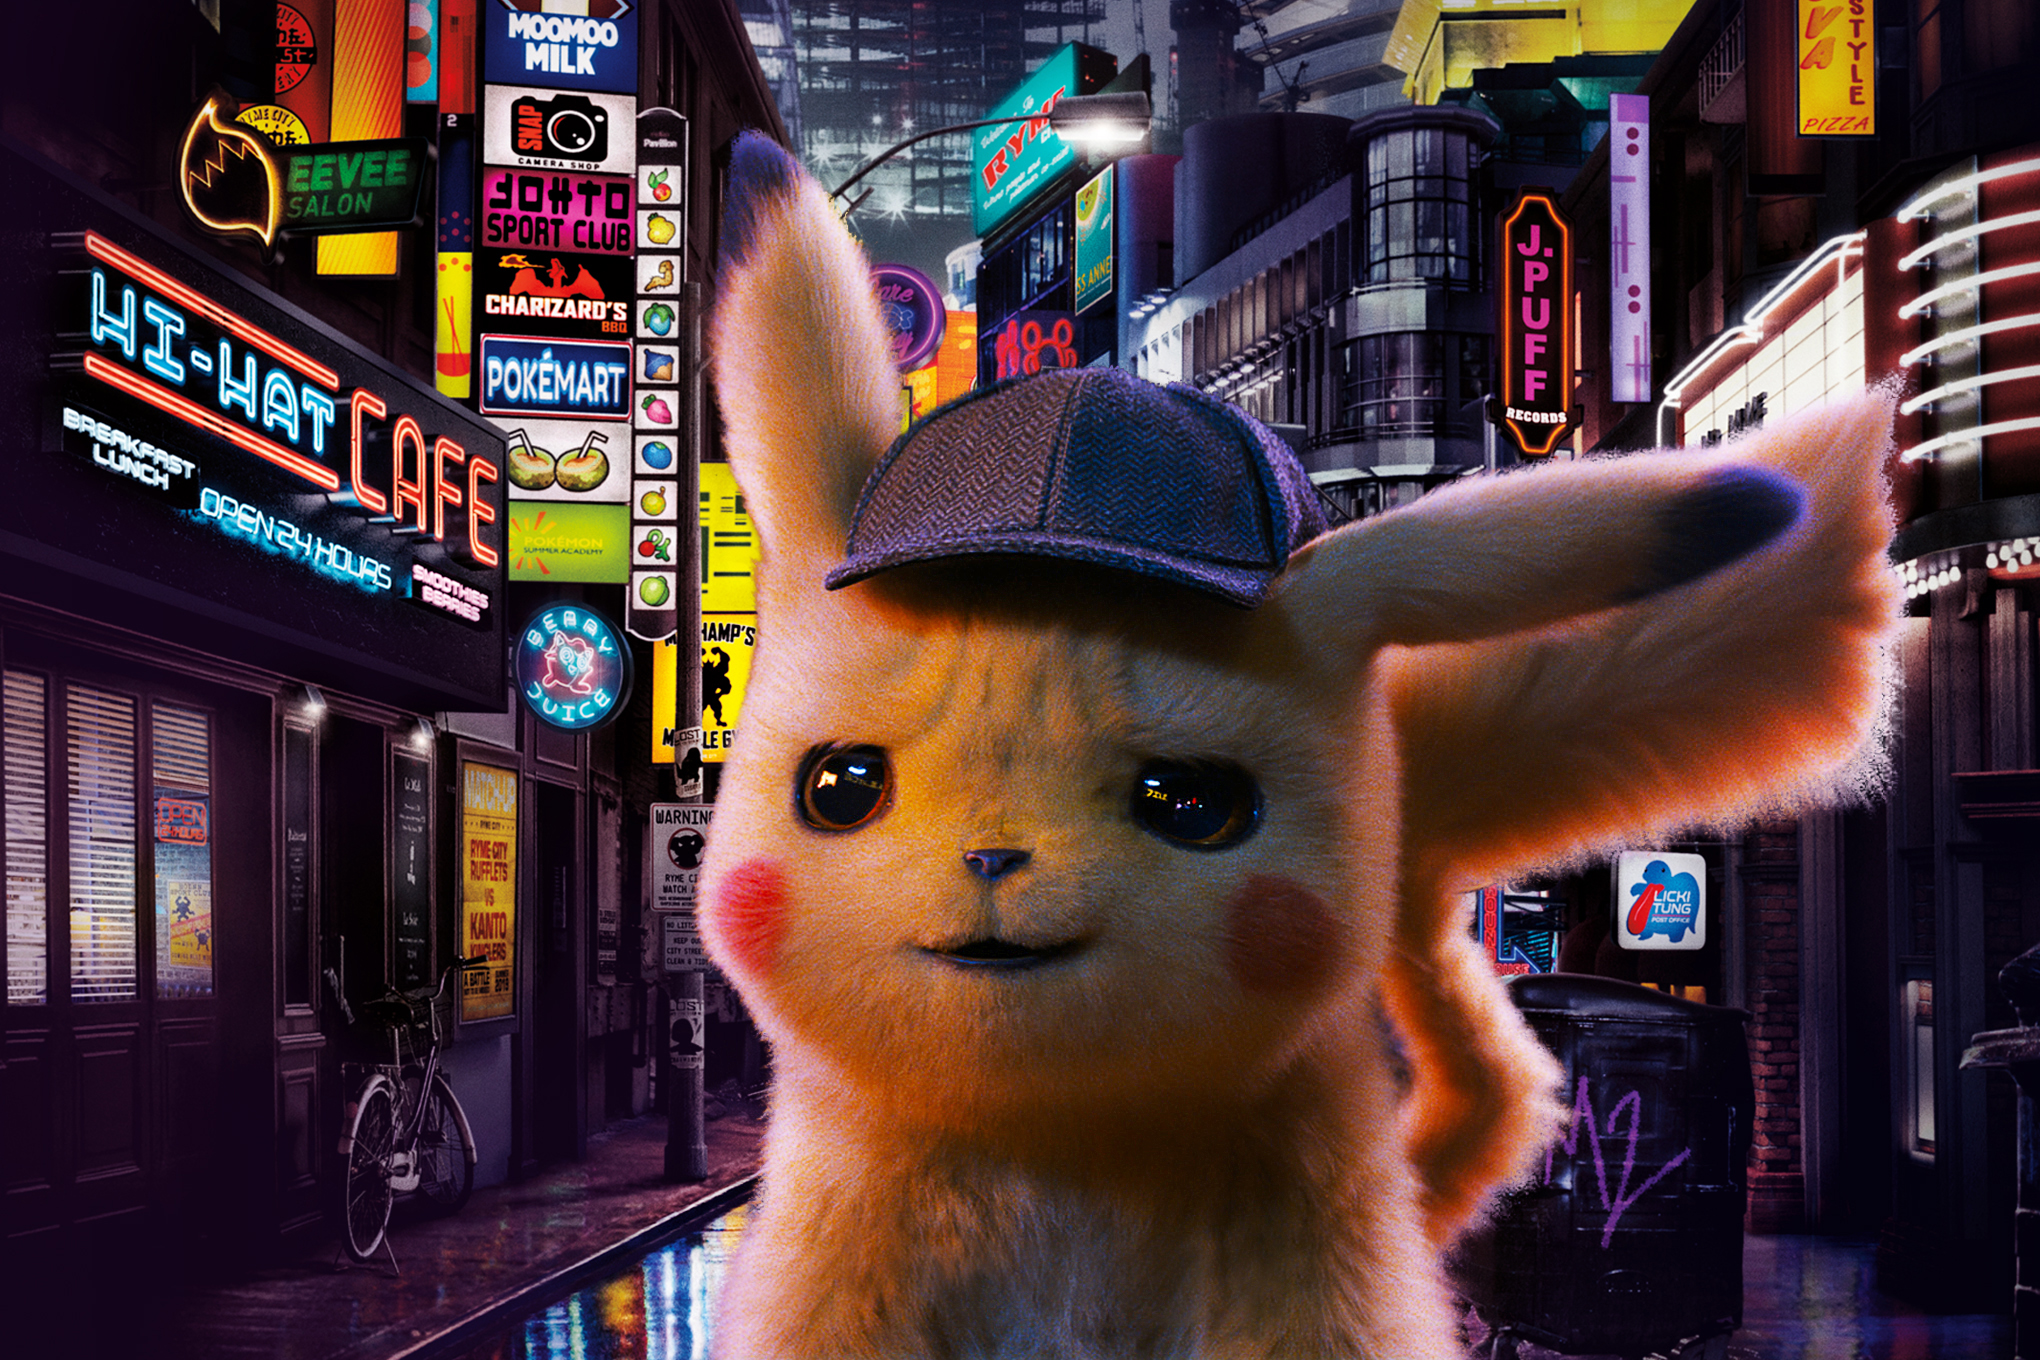 Detective Pikachu artwork